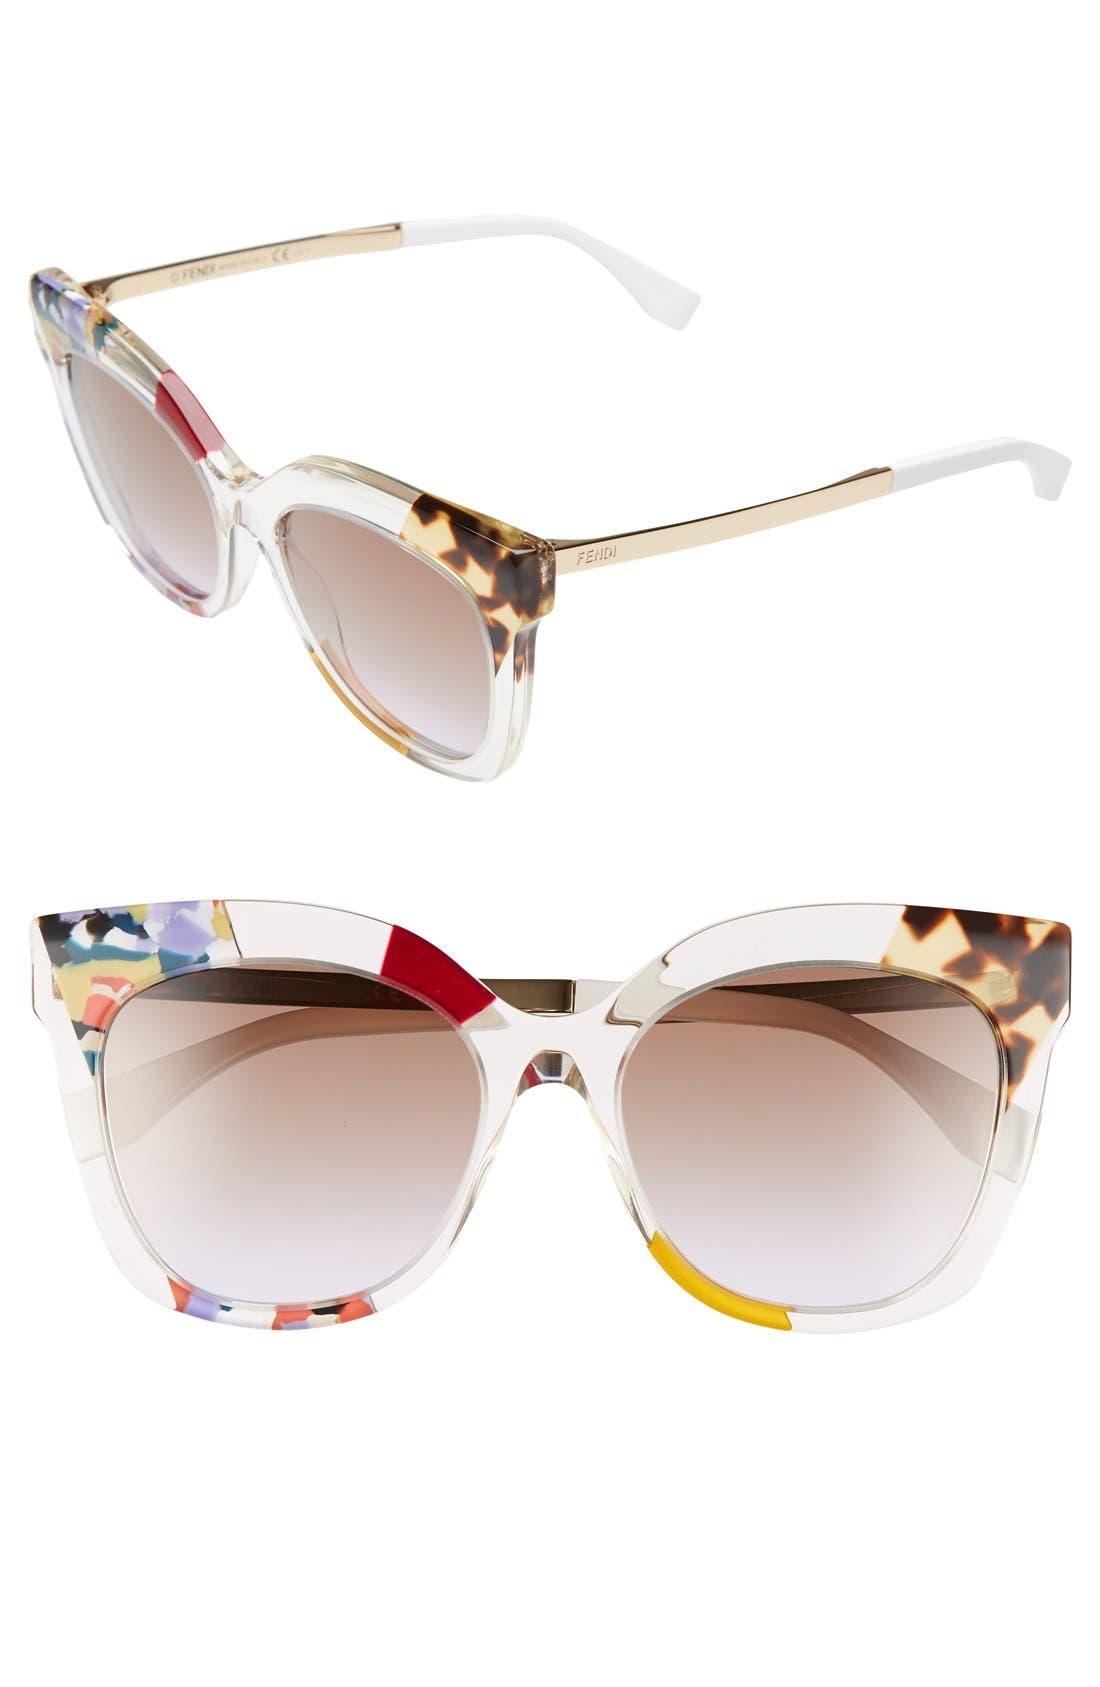 53mm Retro Sunglasses,                         Main,                         color, Honey/ Crystal